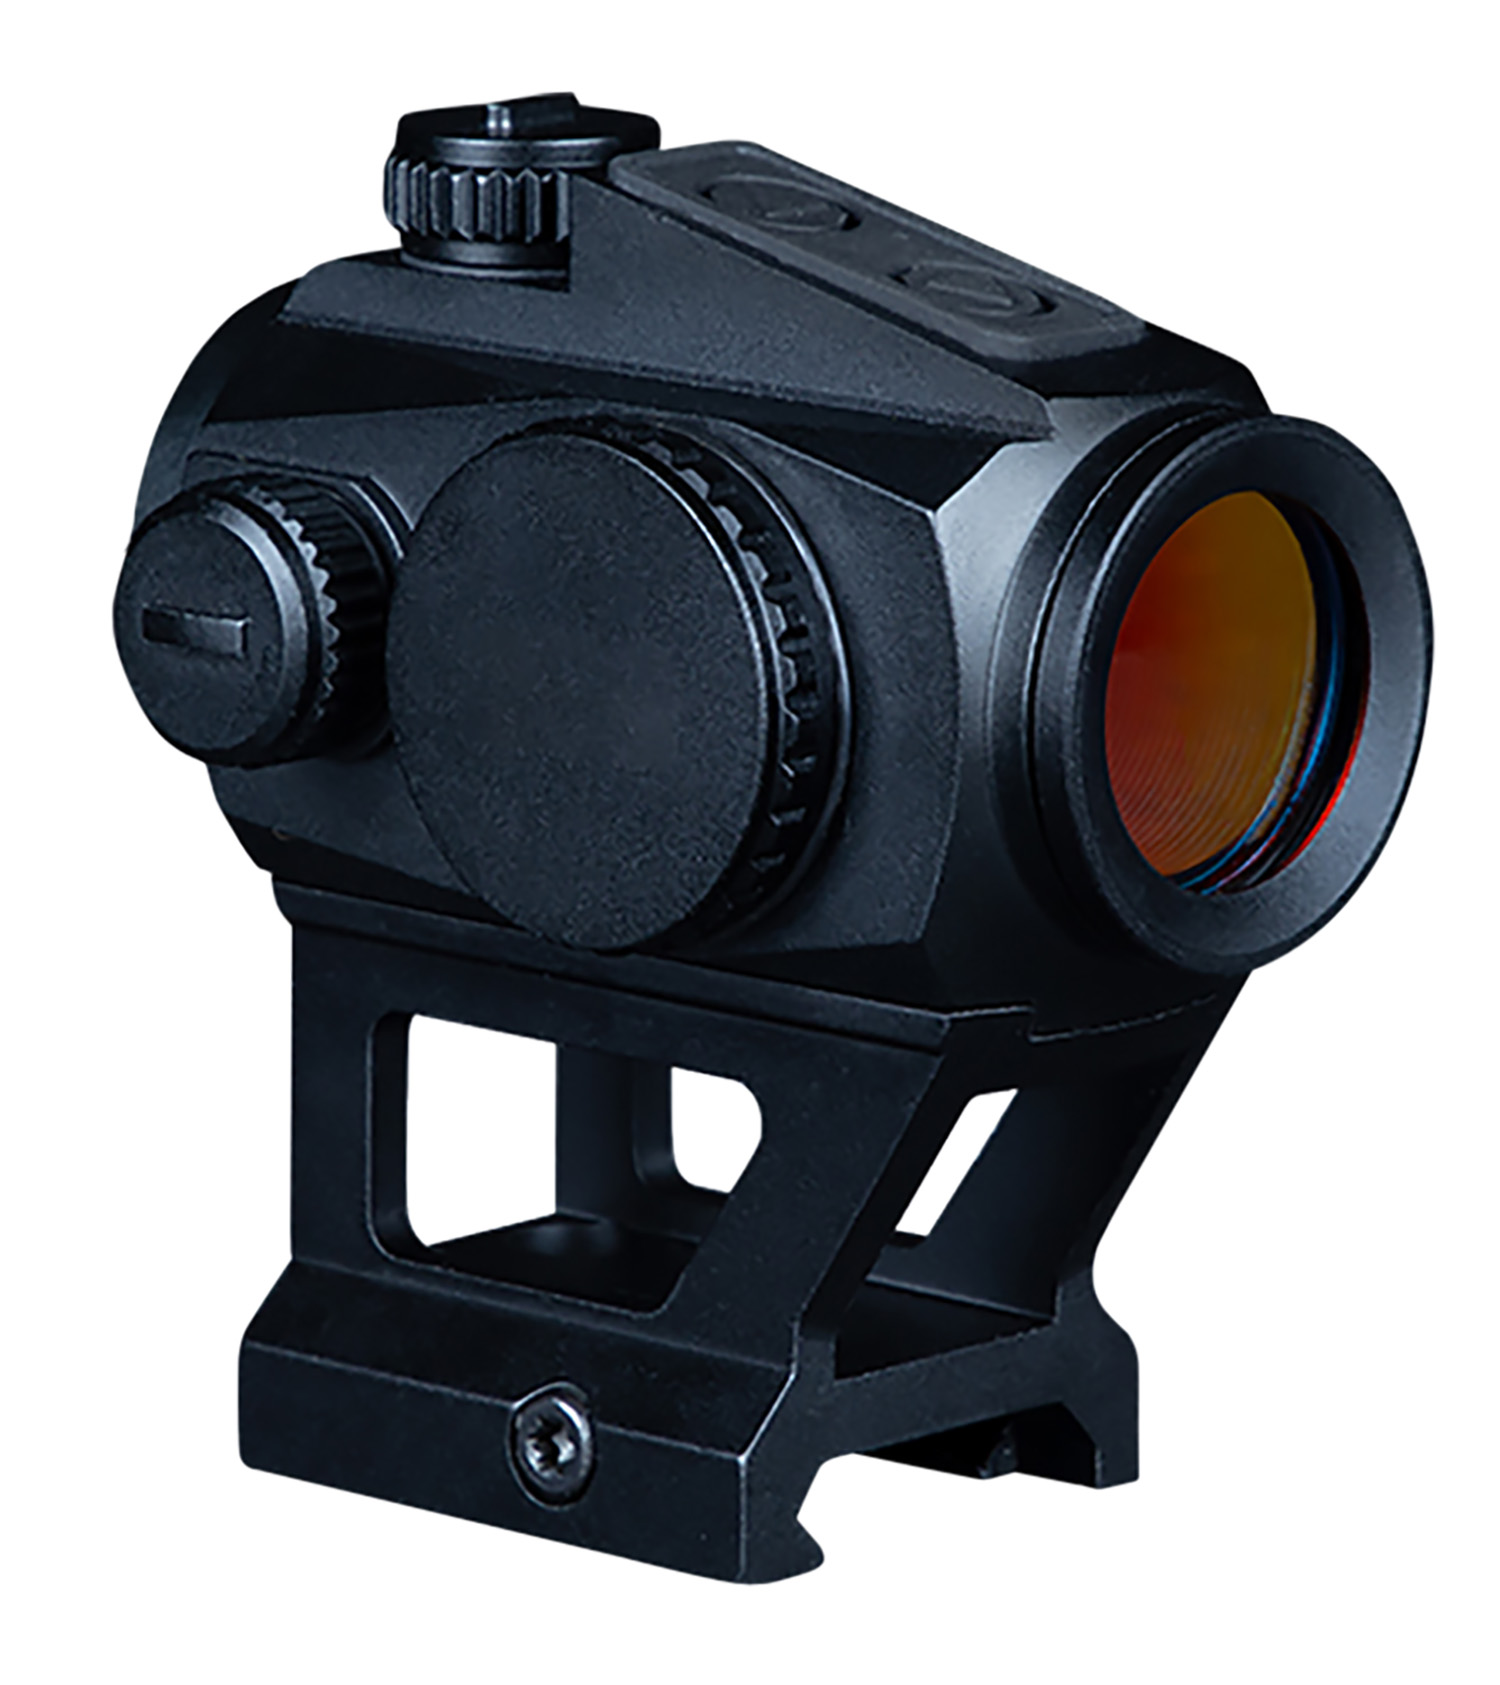 U.S. Optics  TSR-1X  1x 5 MOA Red Dot Black